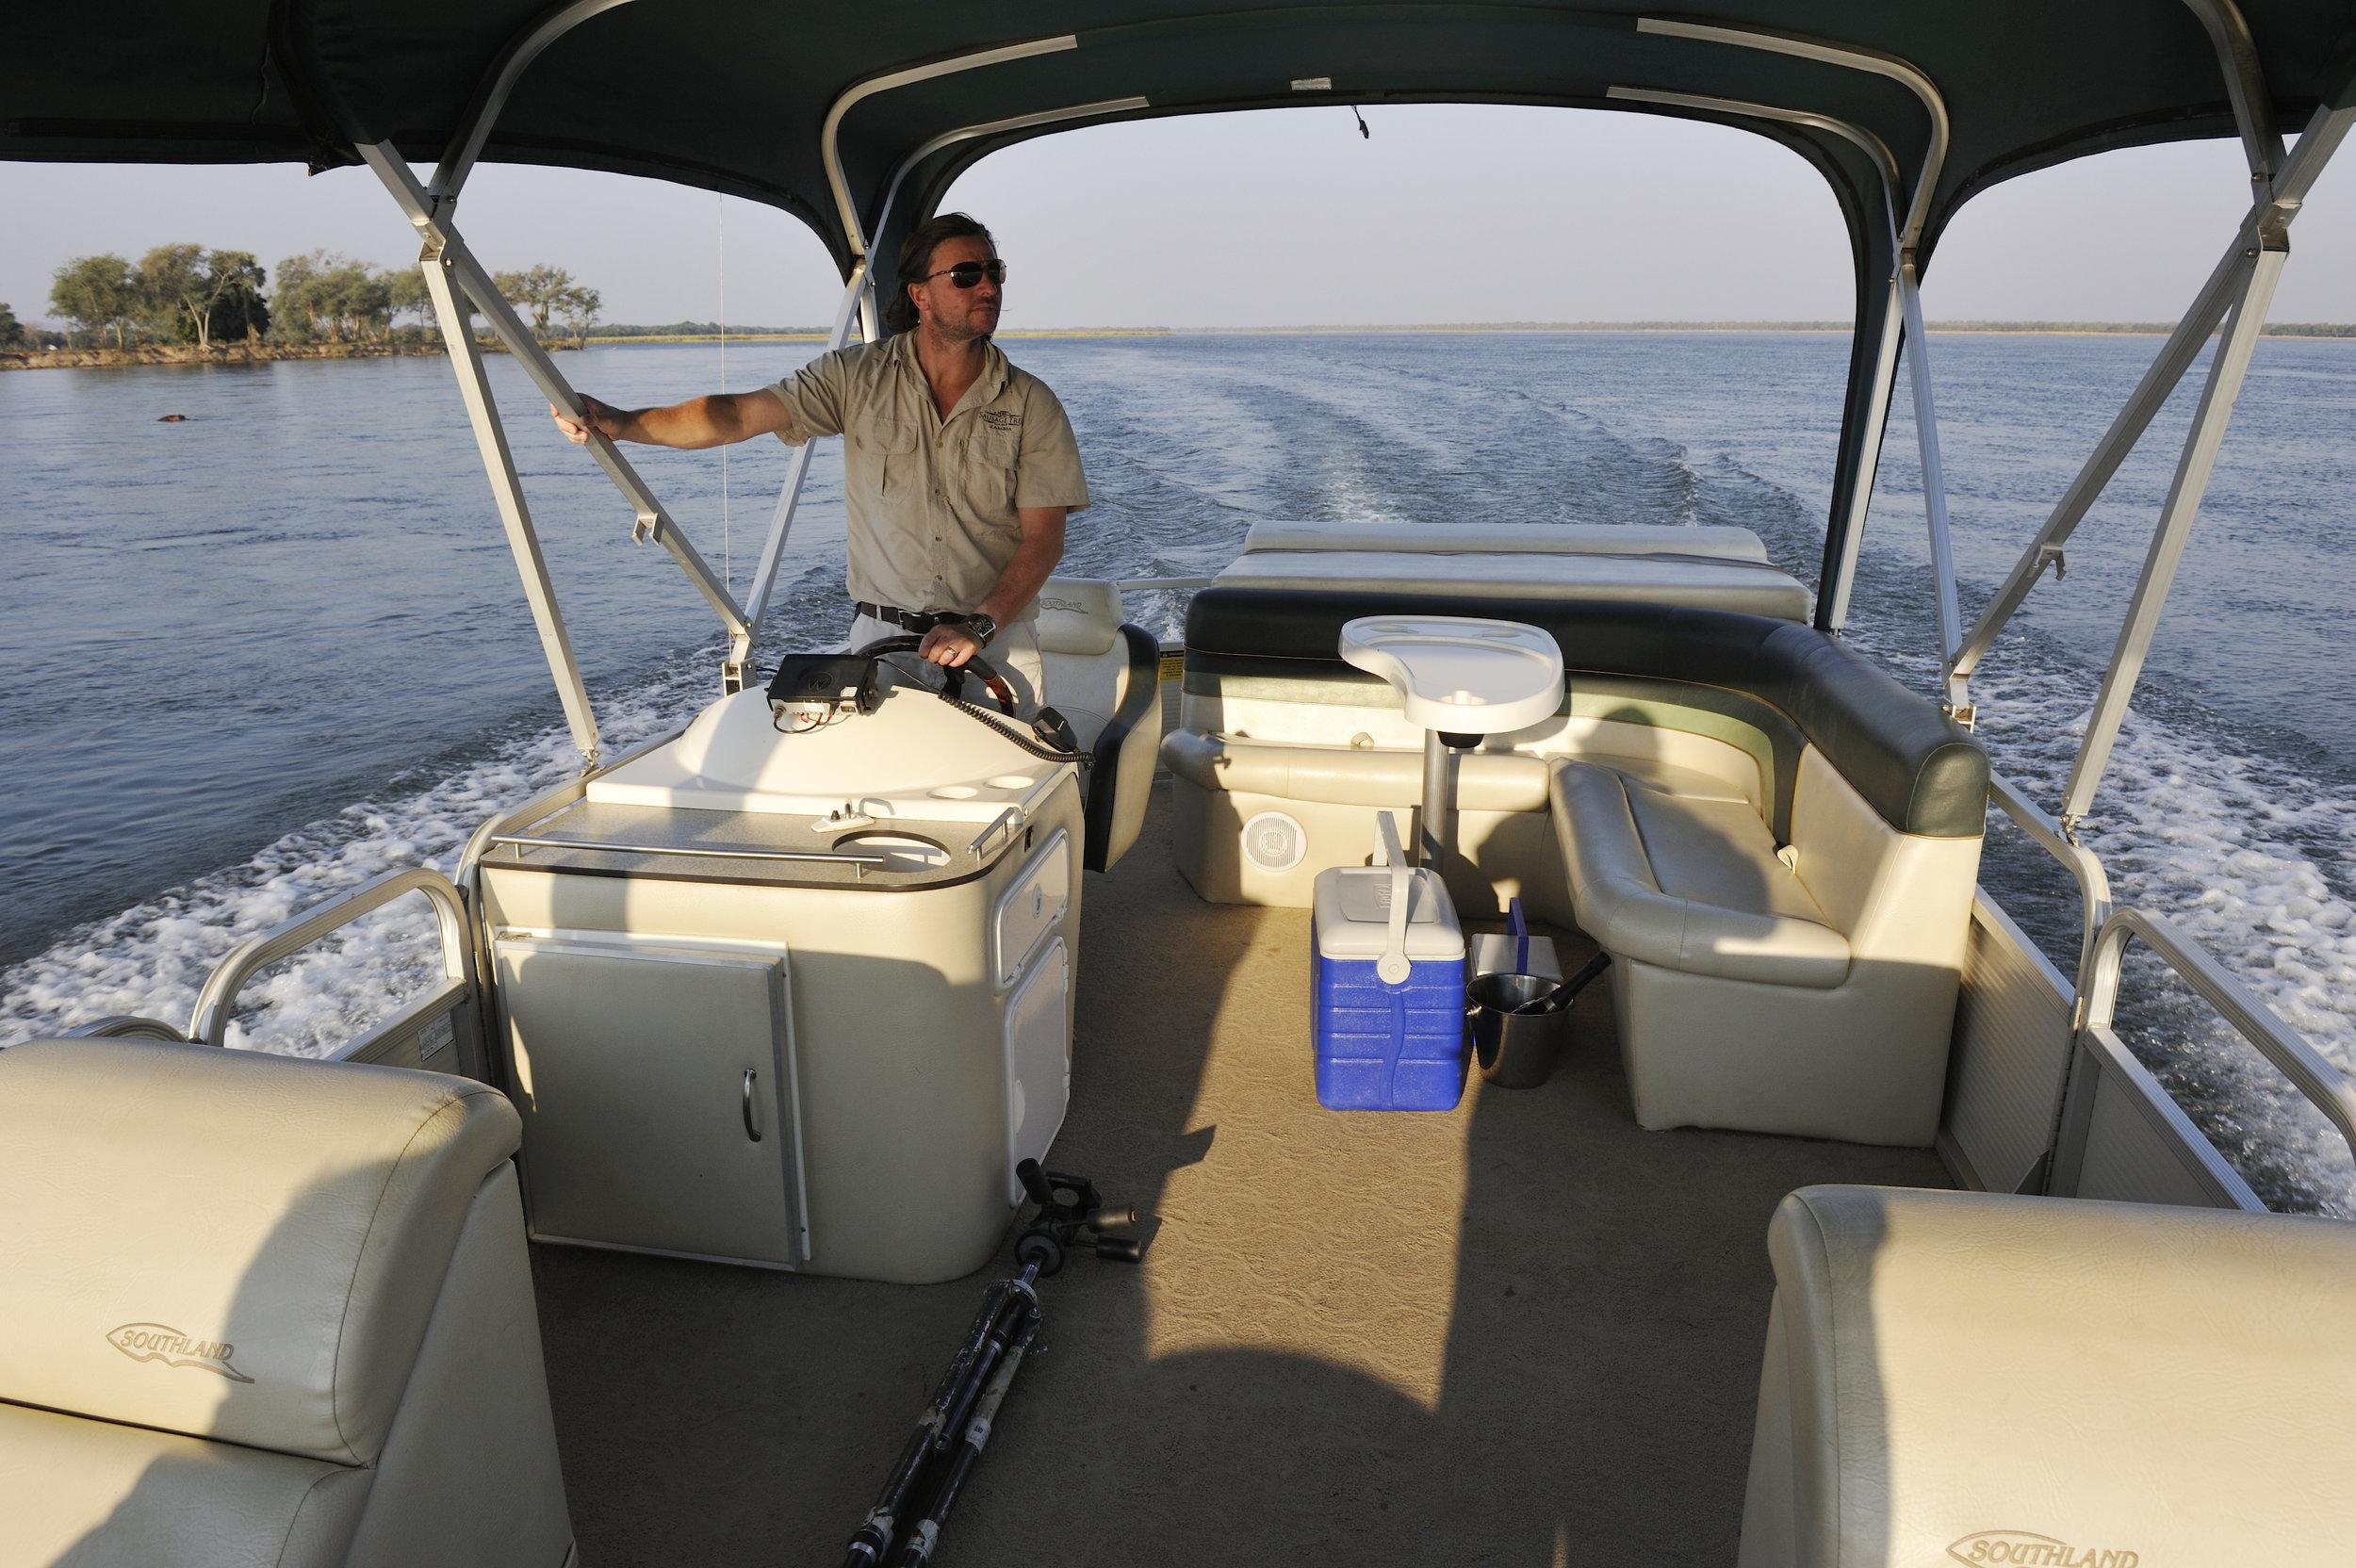 pb_activity_-_boat_cruise.jpg